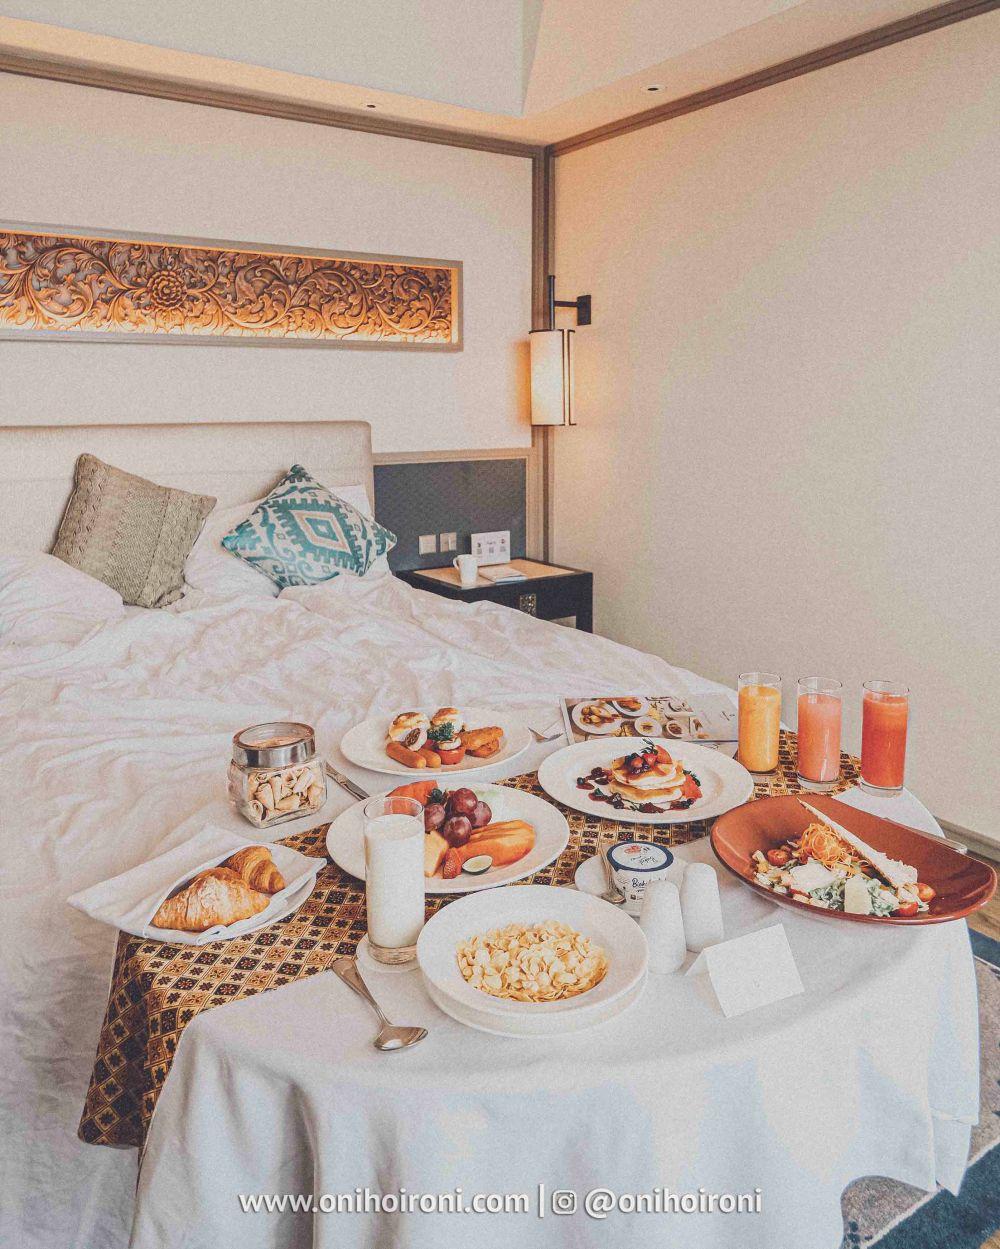 6 Review explore ROOM KAMAR Shangrila Surabaya Hotel Oni hoironi